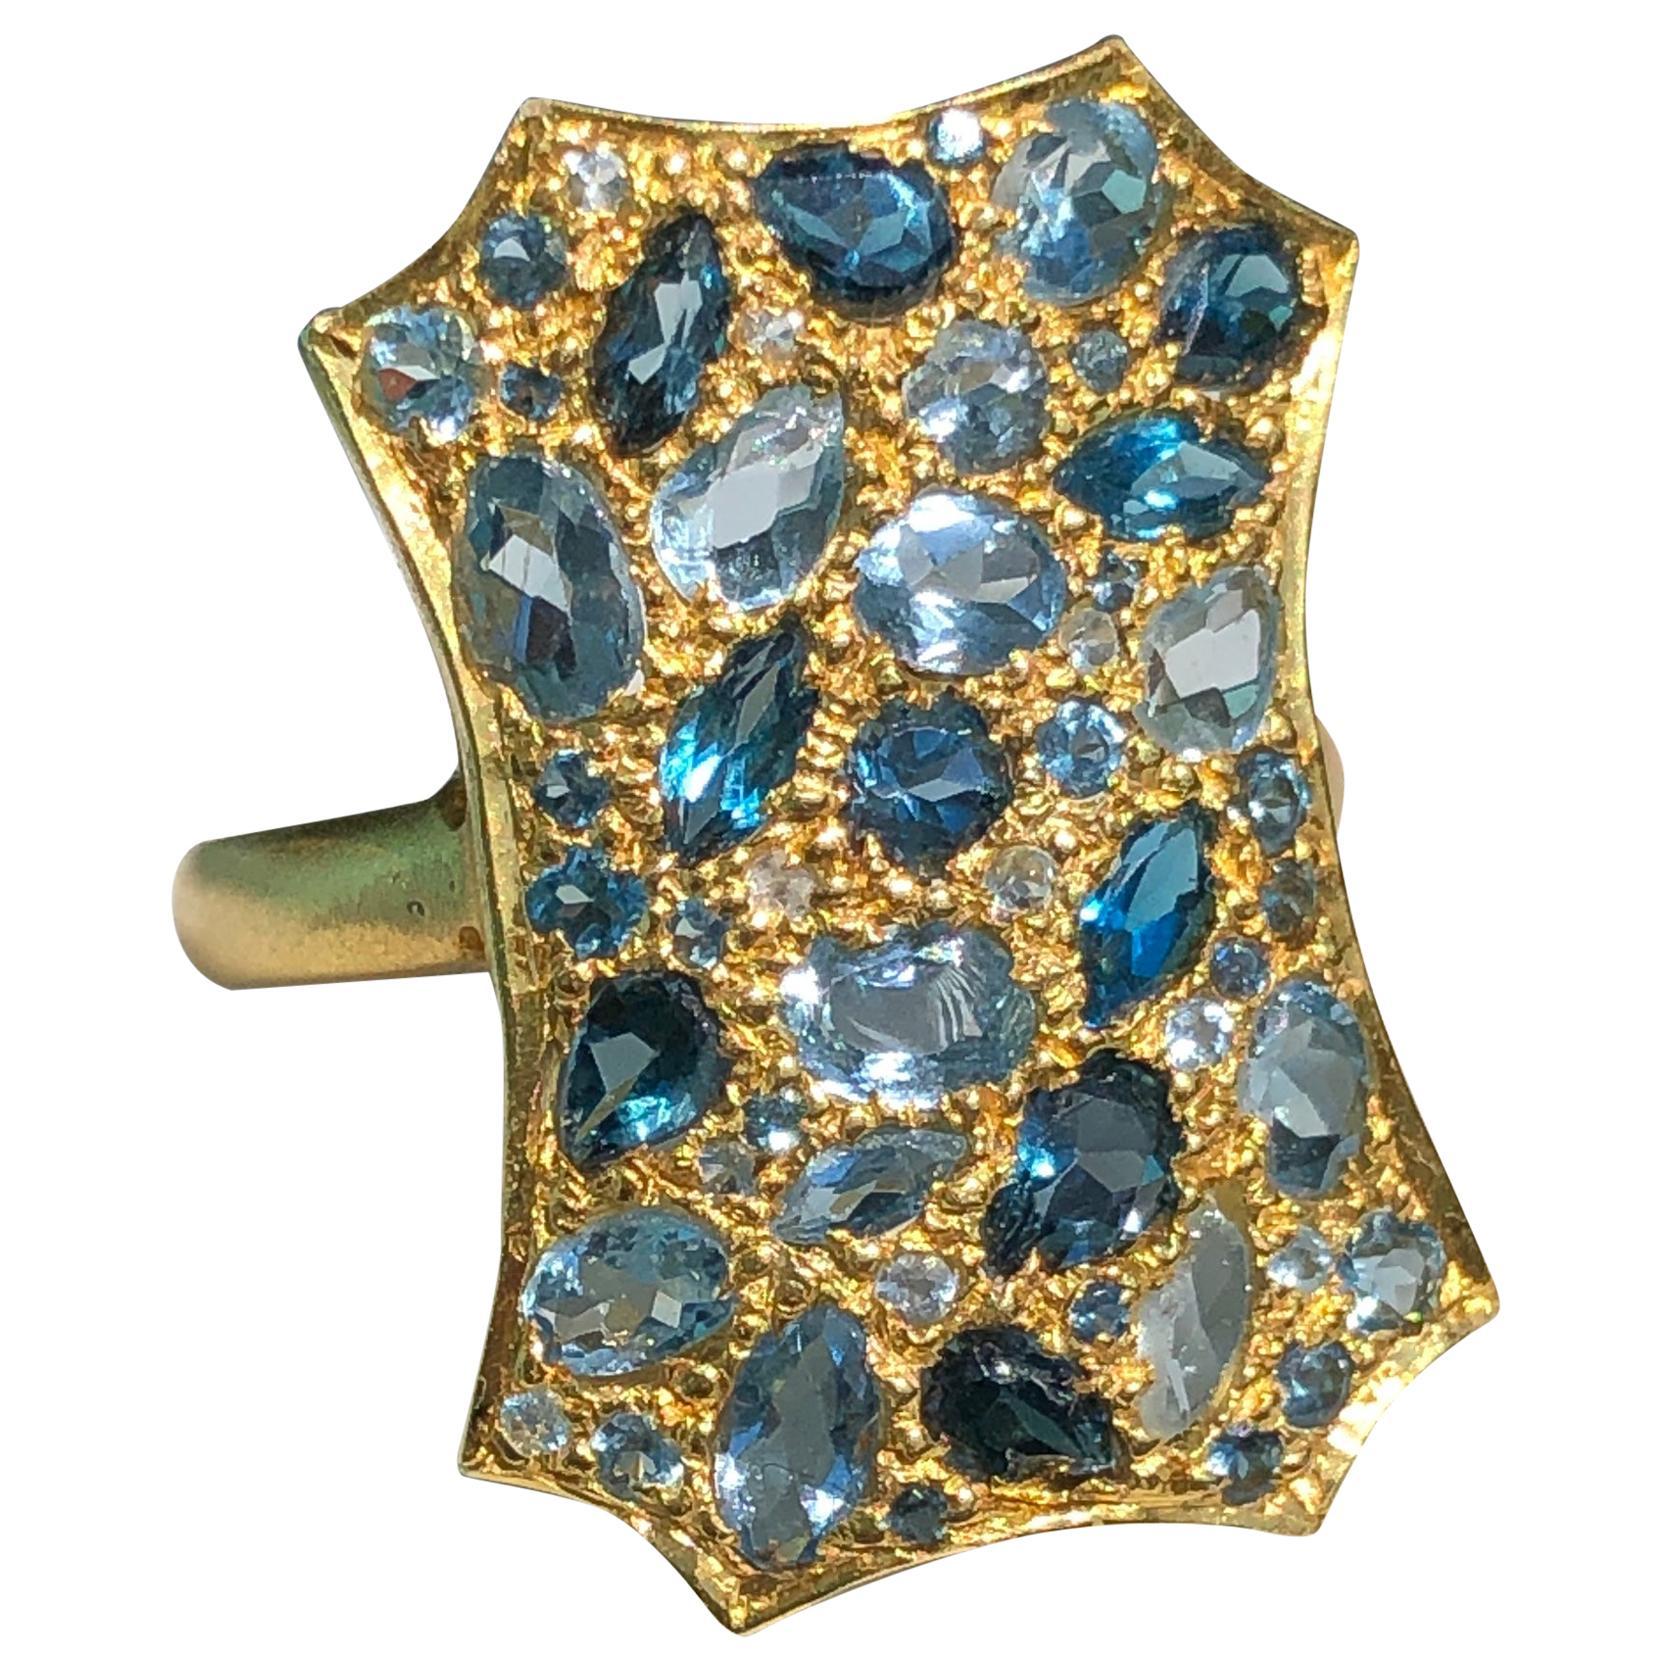 Aquamarine London Blue Topaz Gold Cocktail Ring by Lauren Harper